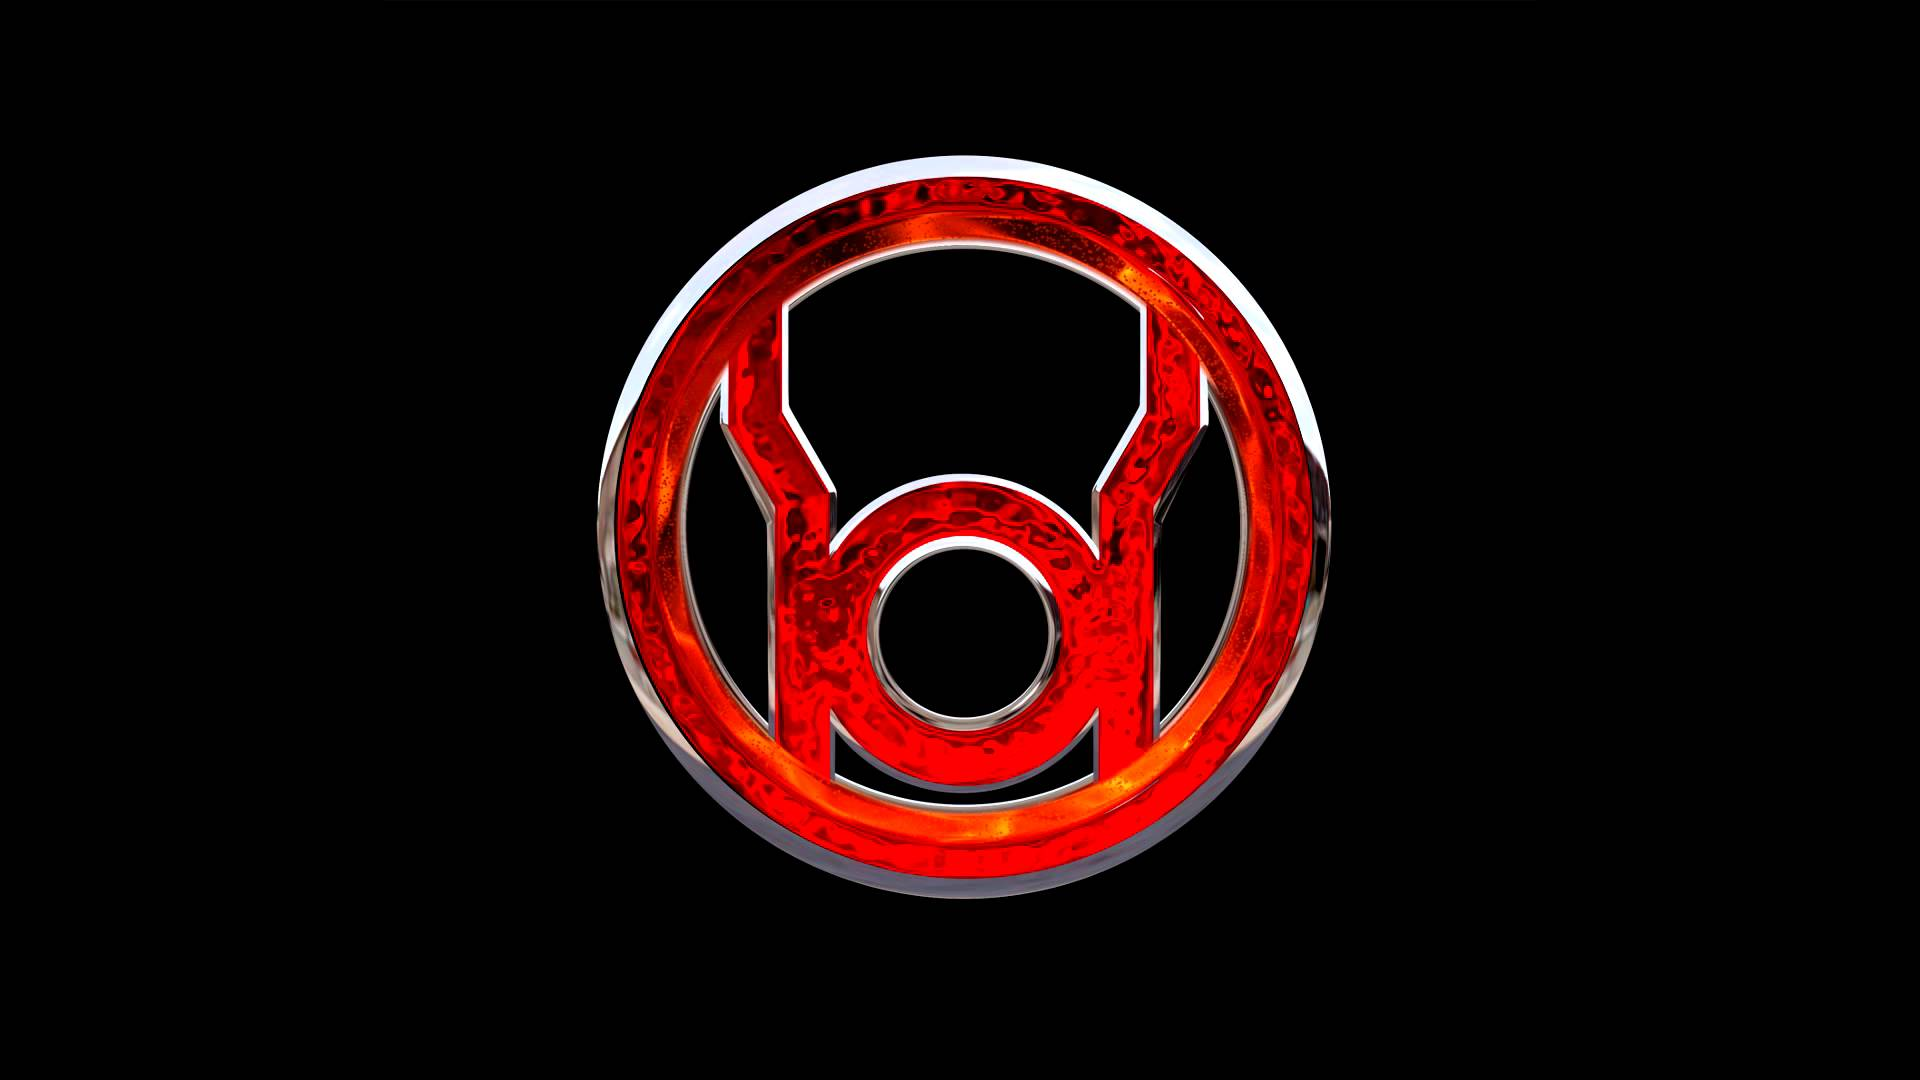 Red Lantern Oaths Maxresdefaultjpg 1920x1080